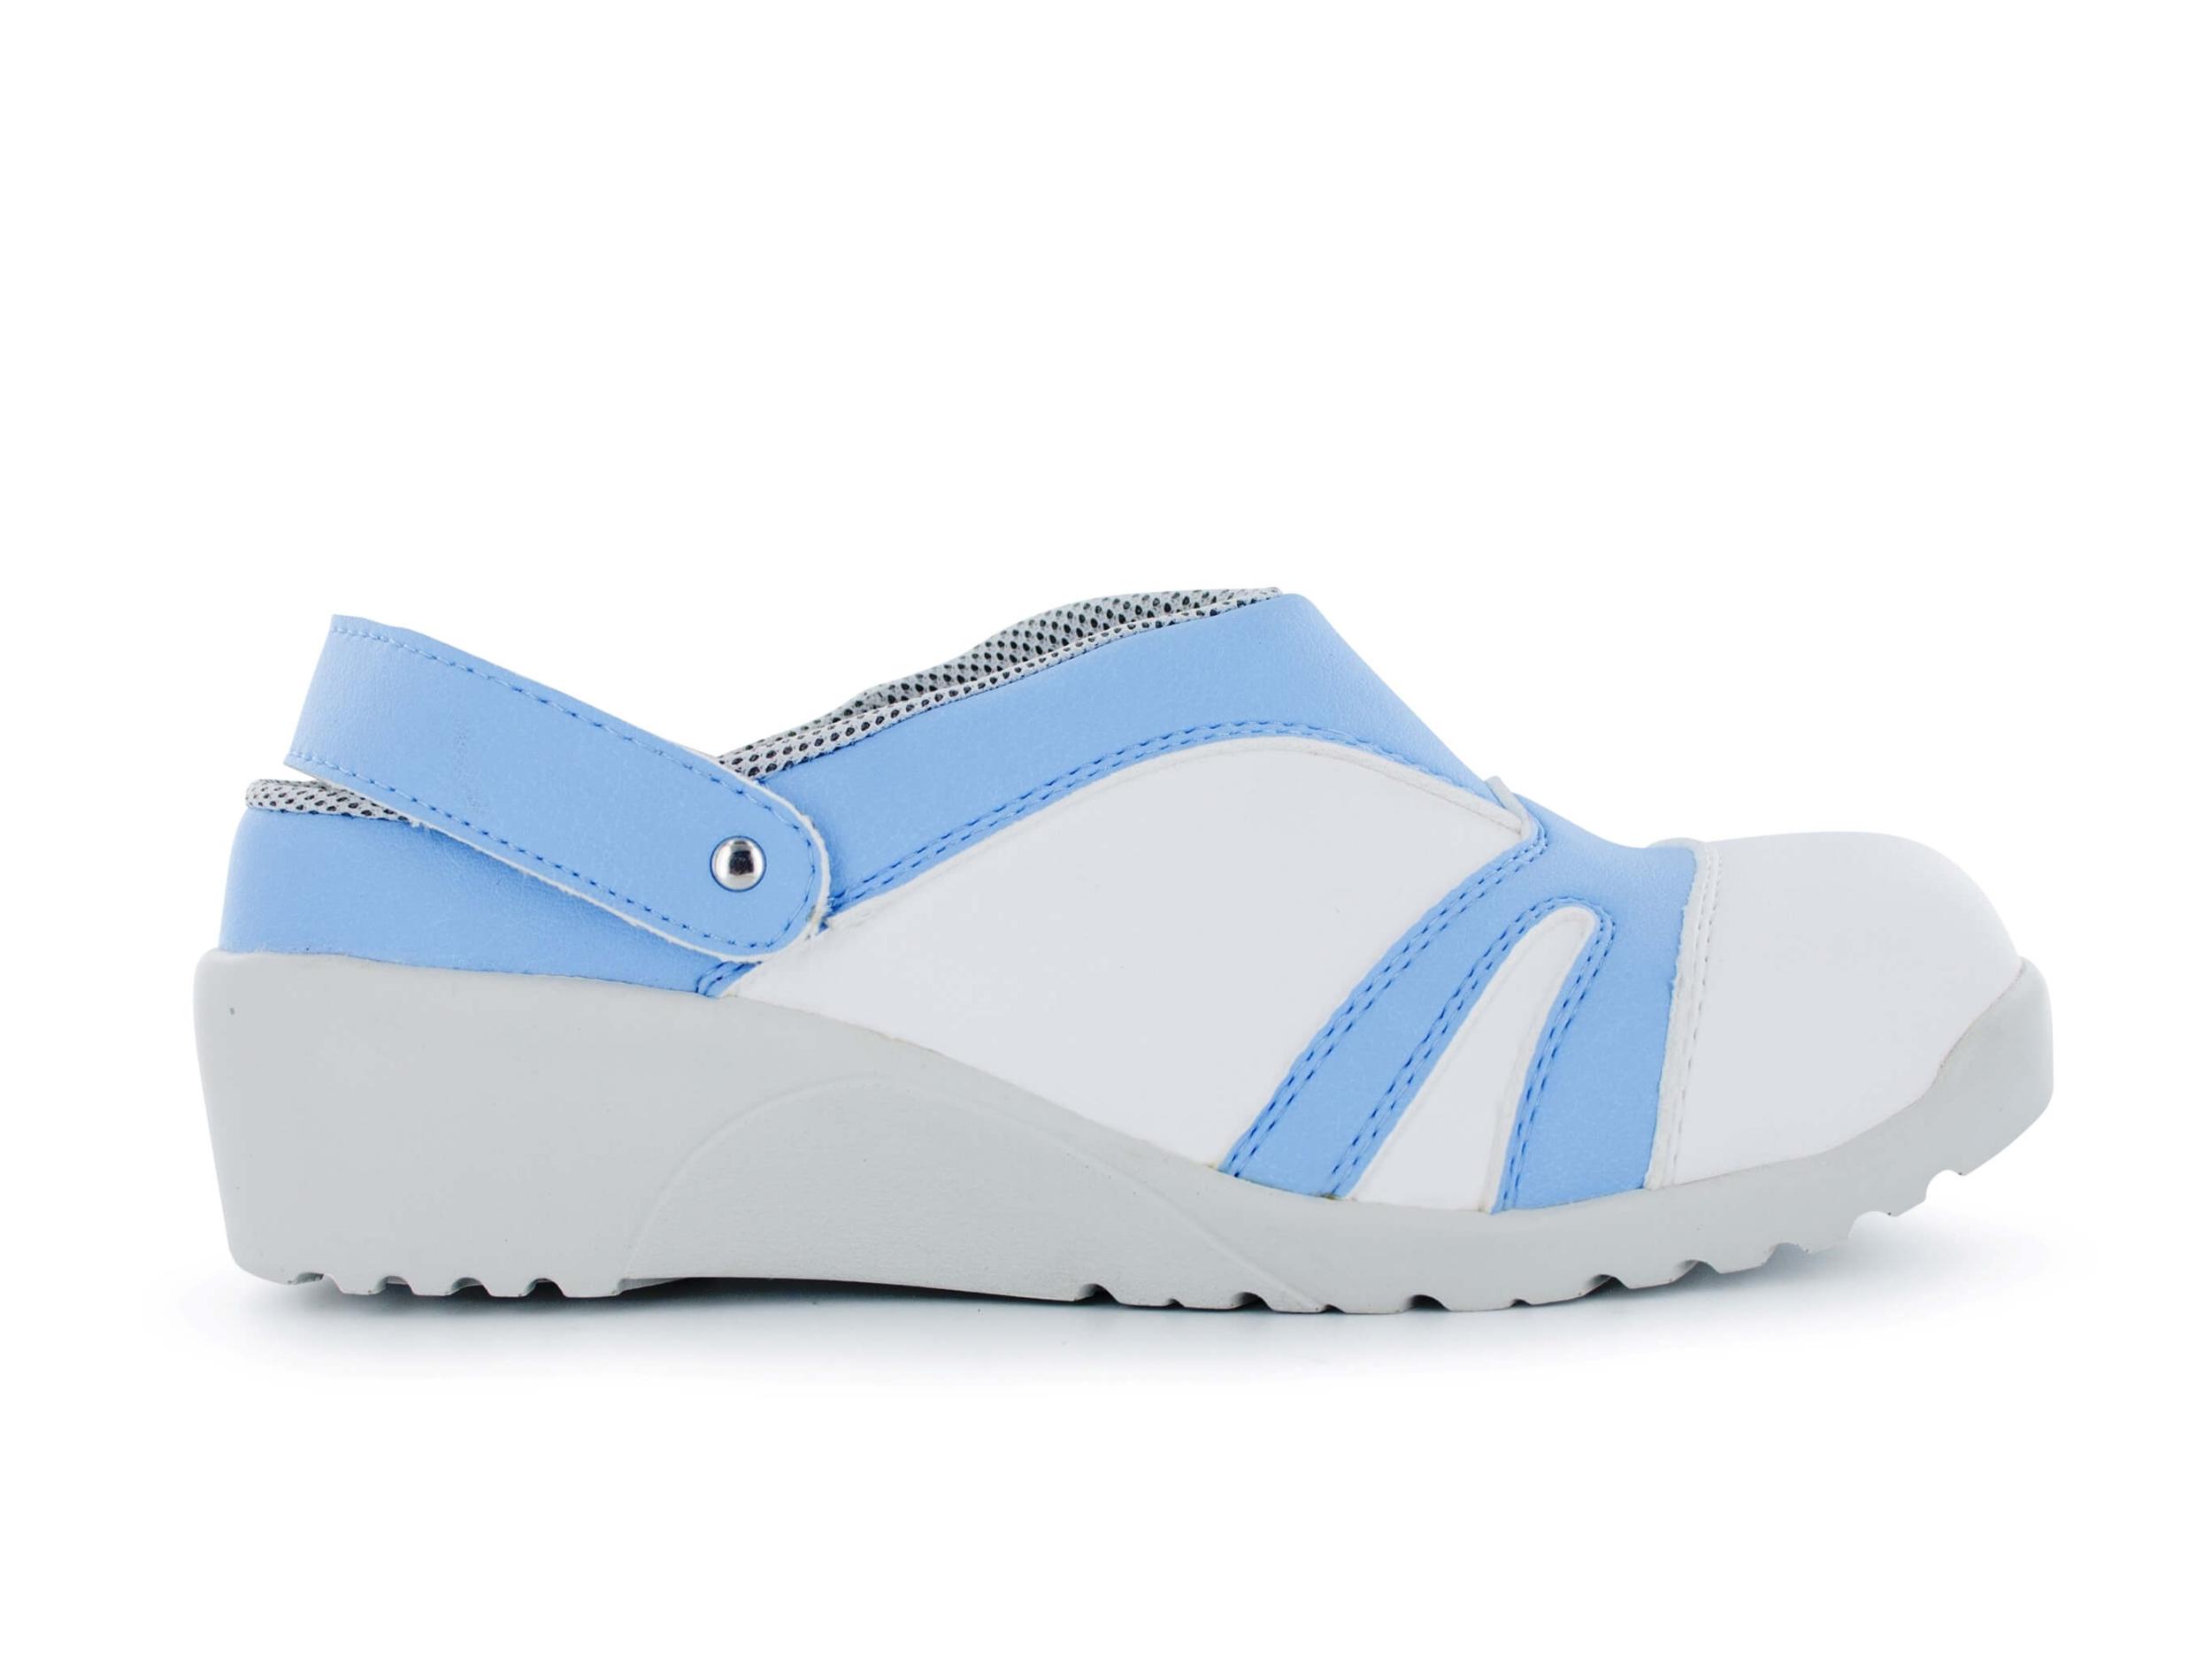 Chaussures Chaussures Chaussures et sabot dé sécurité 993093